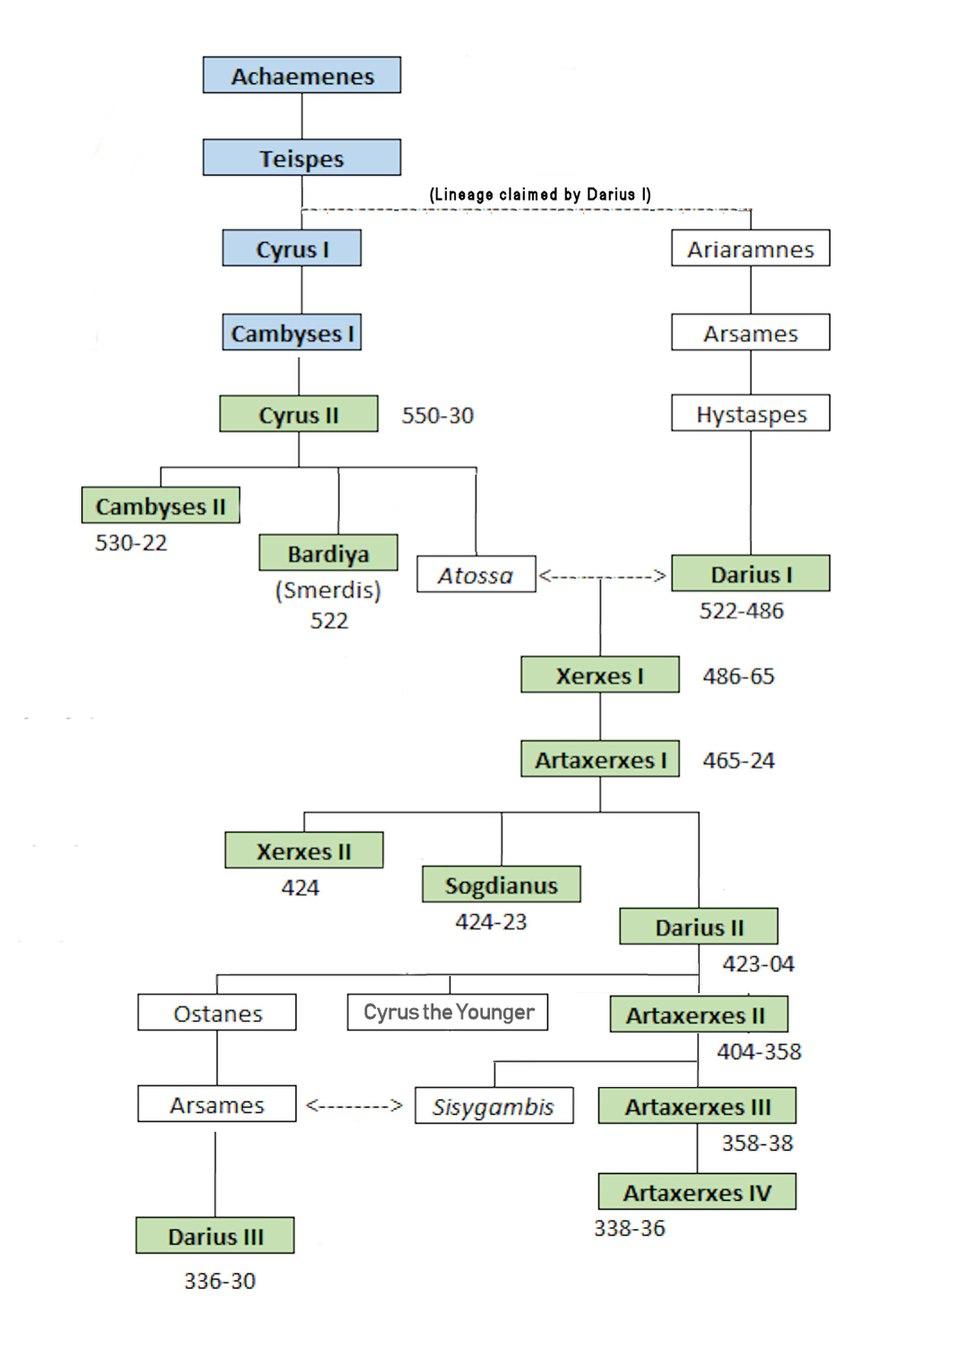 Achaemenid lineage